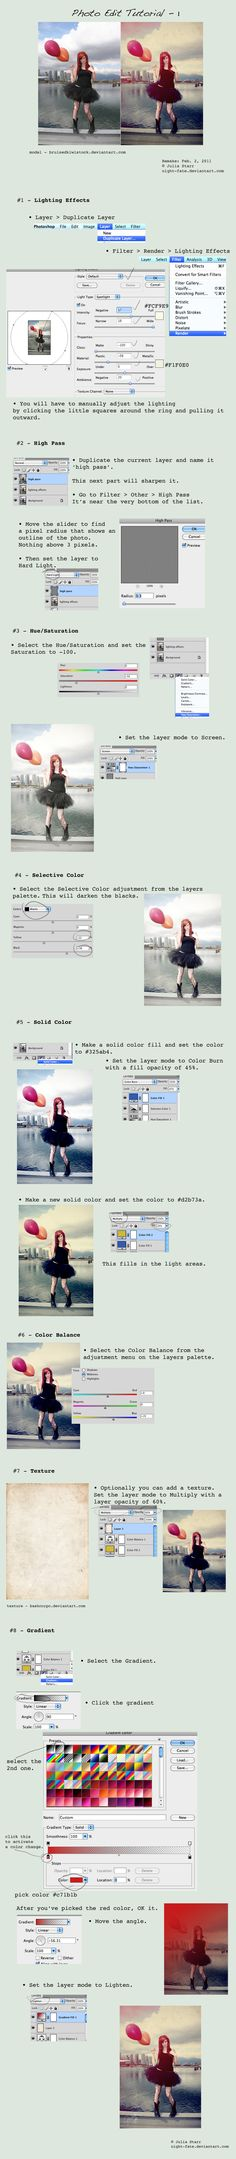 photo edit tutorial - 1 by night-fate.deviantart.com on @deviantART